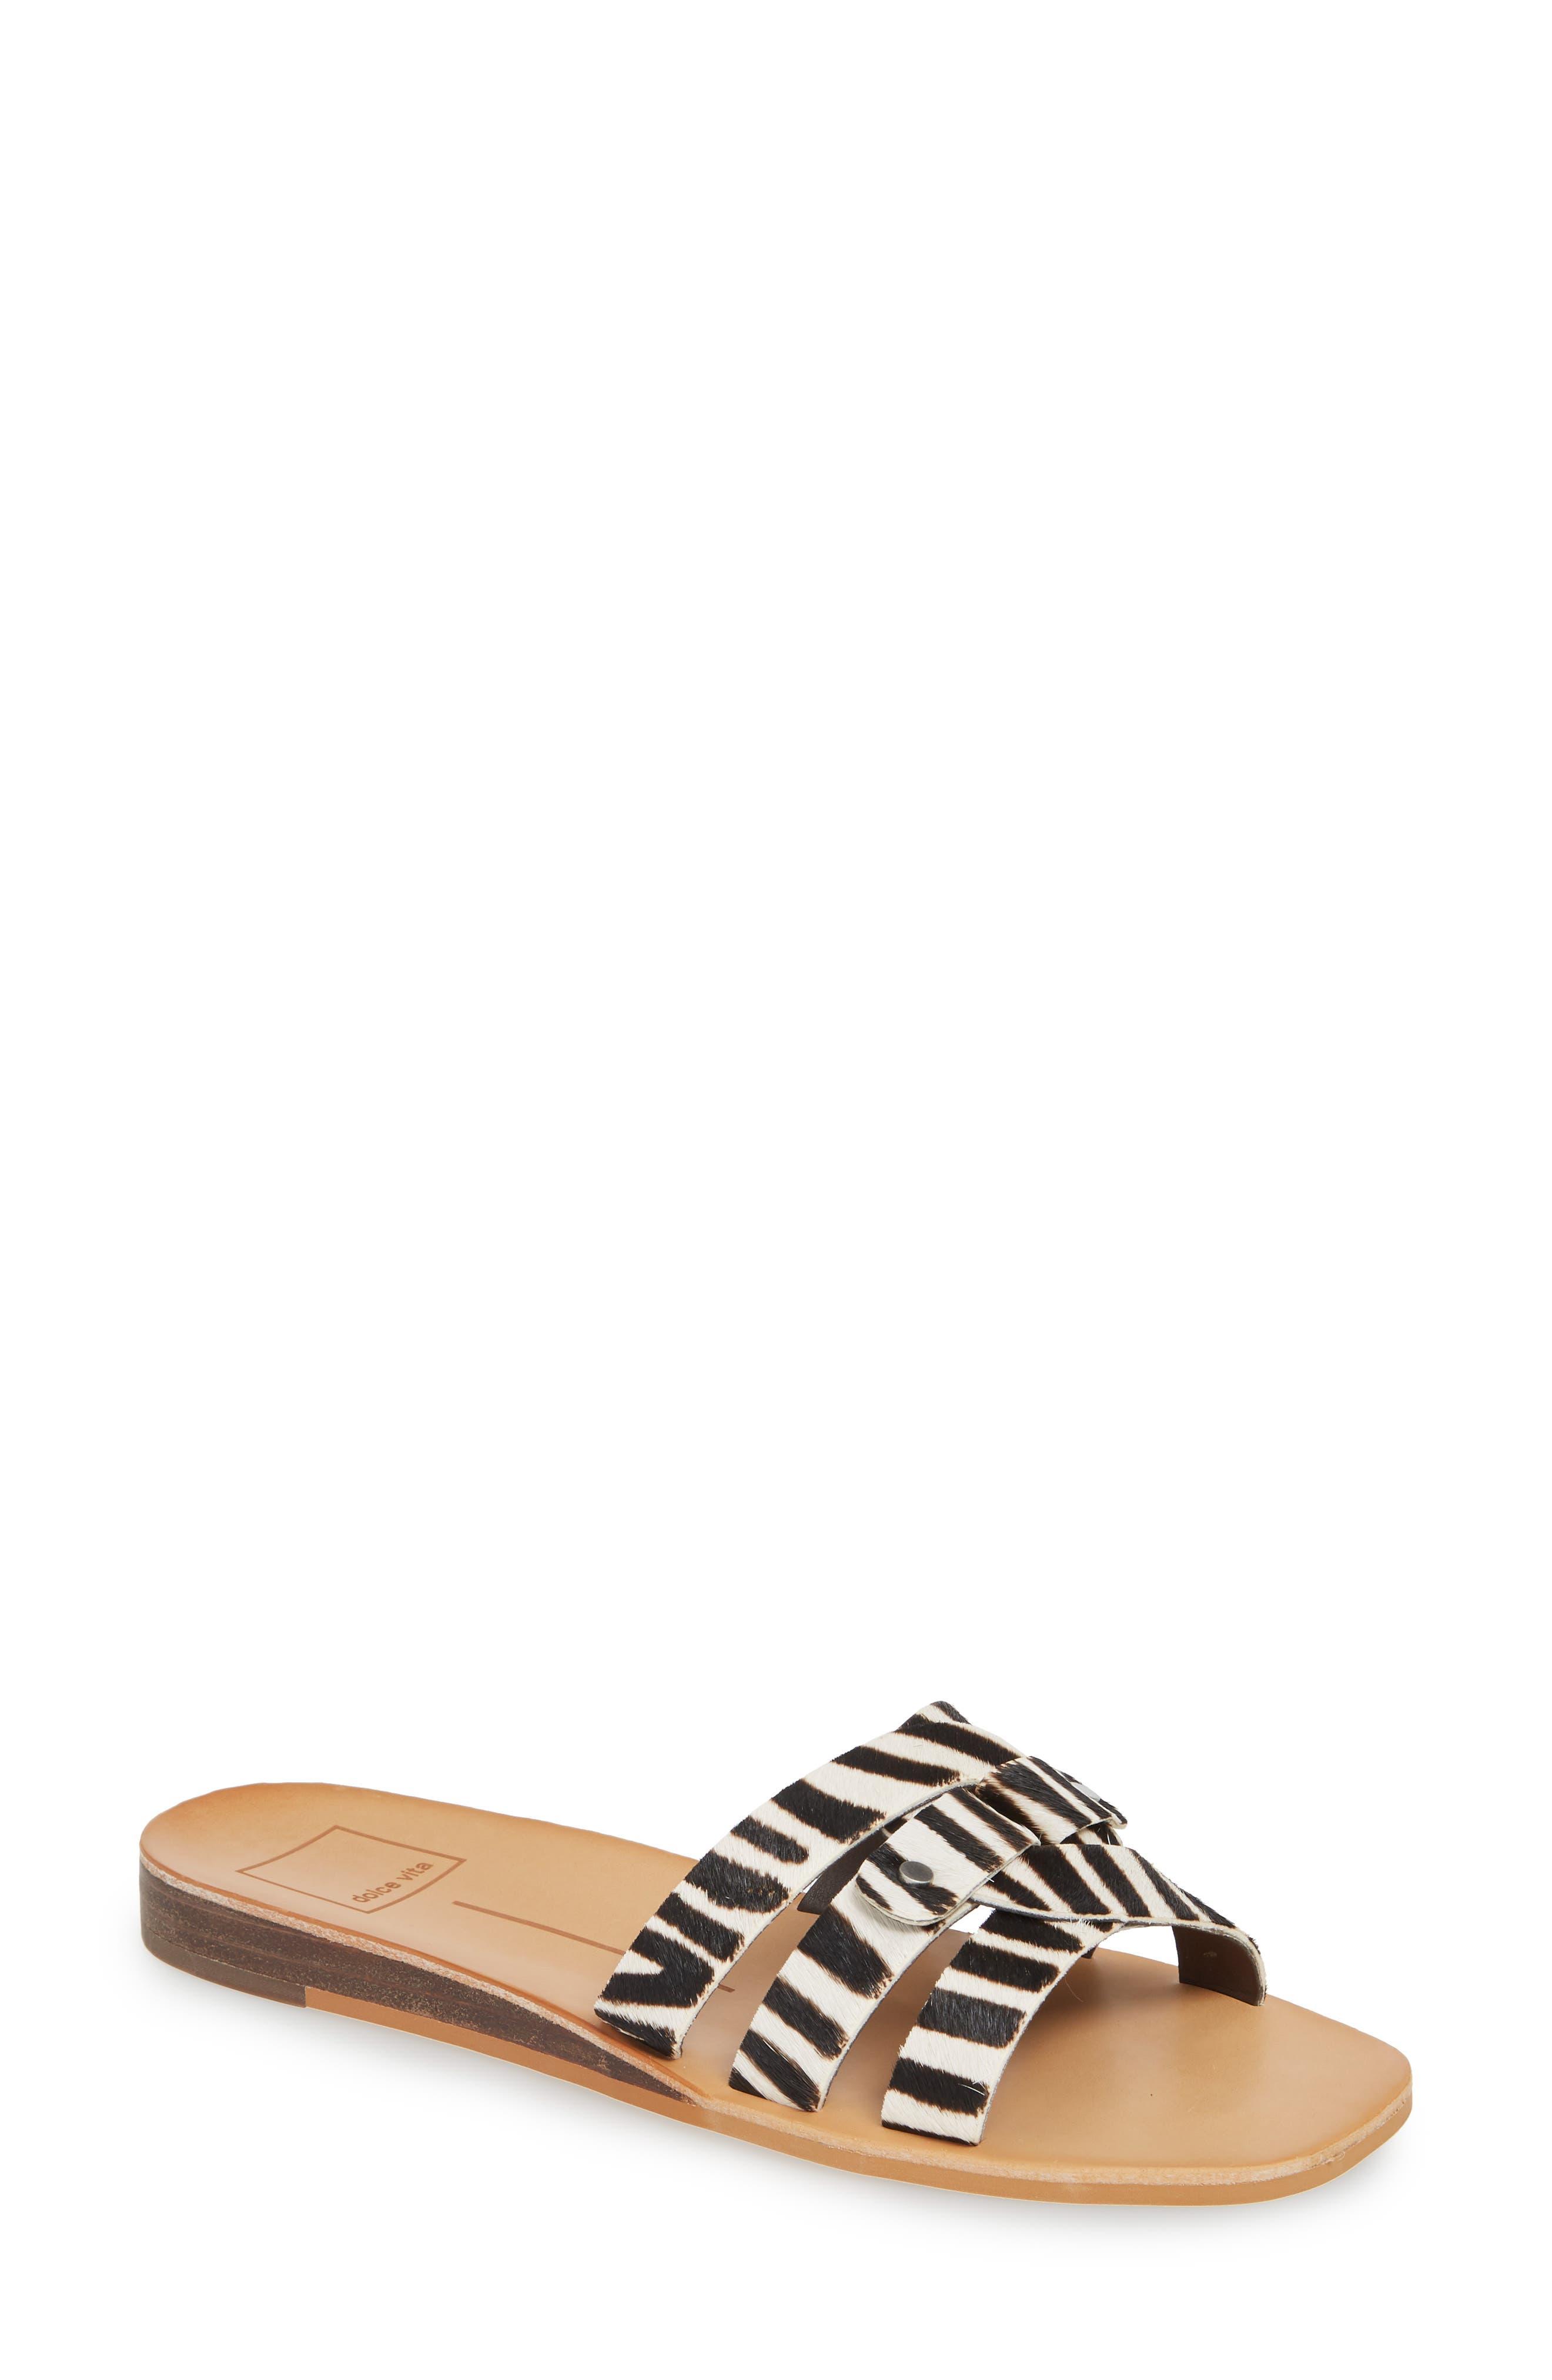 DOLCE VITA, Cait Genuine Calf Hair Slide Sandal, Main thumbnail 1, color, ZEBRA PRINT